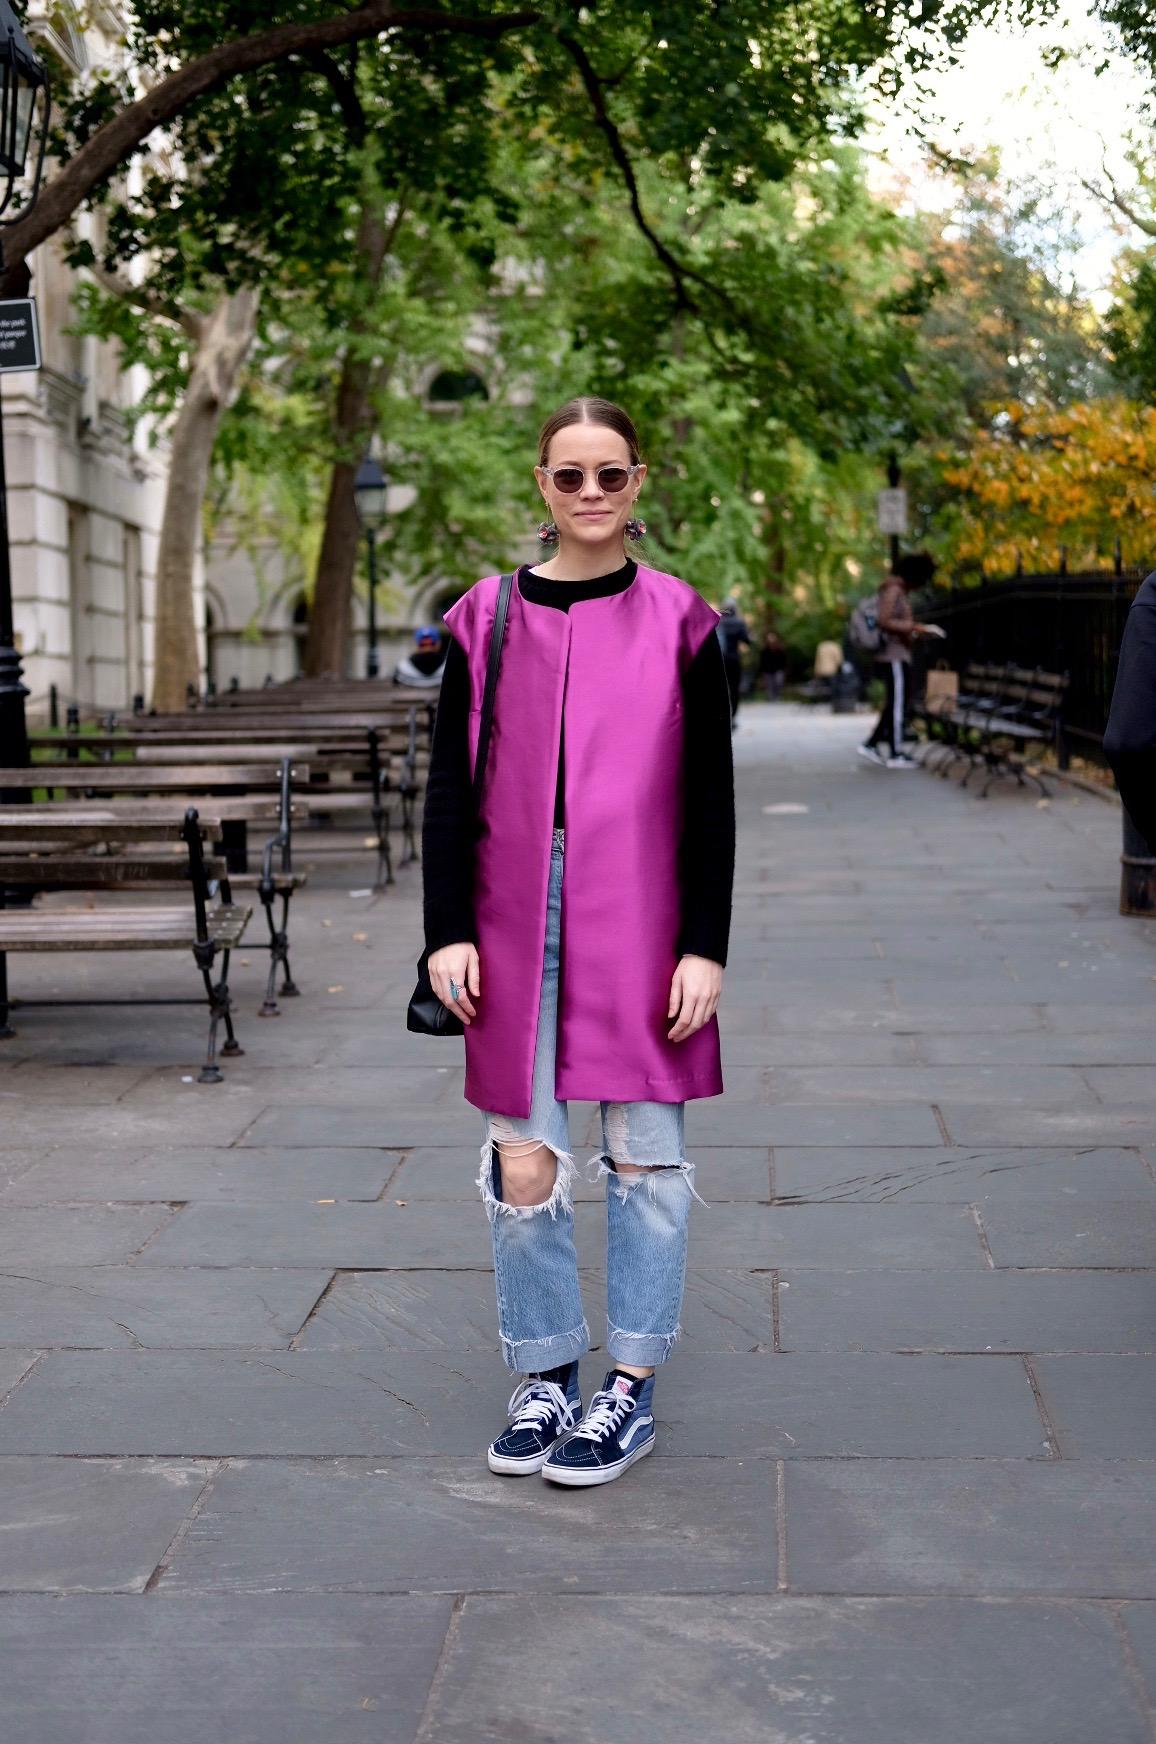 Downtown NYC.Silk wool vest,  Mood Fabrics, J.Crew  cashmere sweater , Levi's  vintage jeans , Vans  old school   high-tops,  Alexander Wang  bag , Moscot  sunglasses ,J.Crew  earrings .